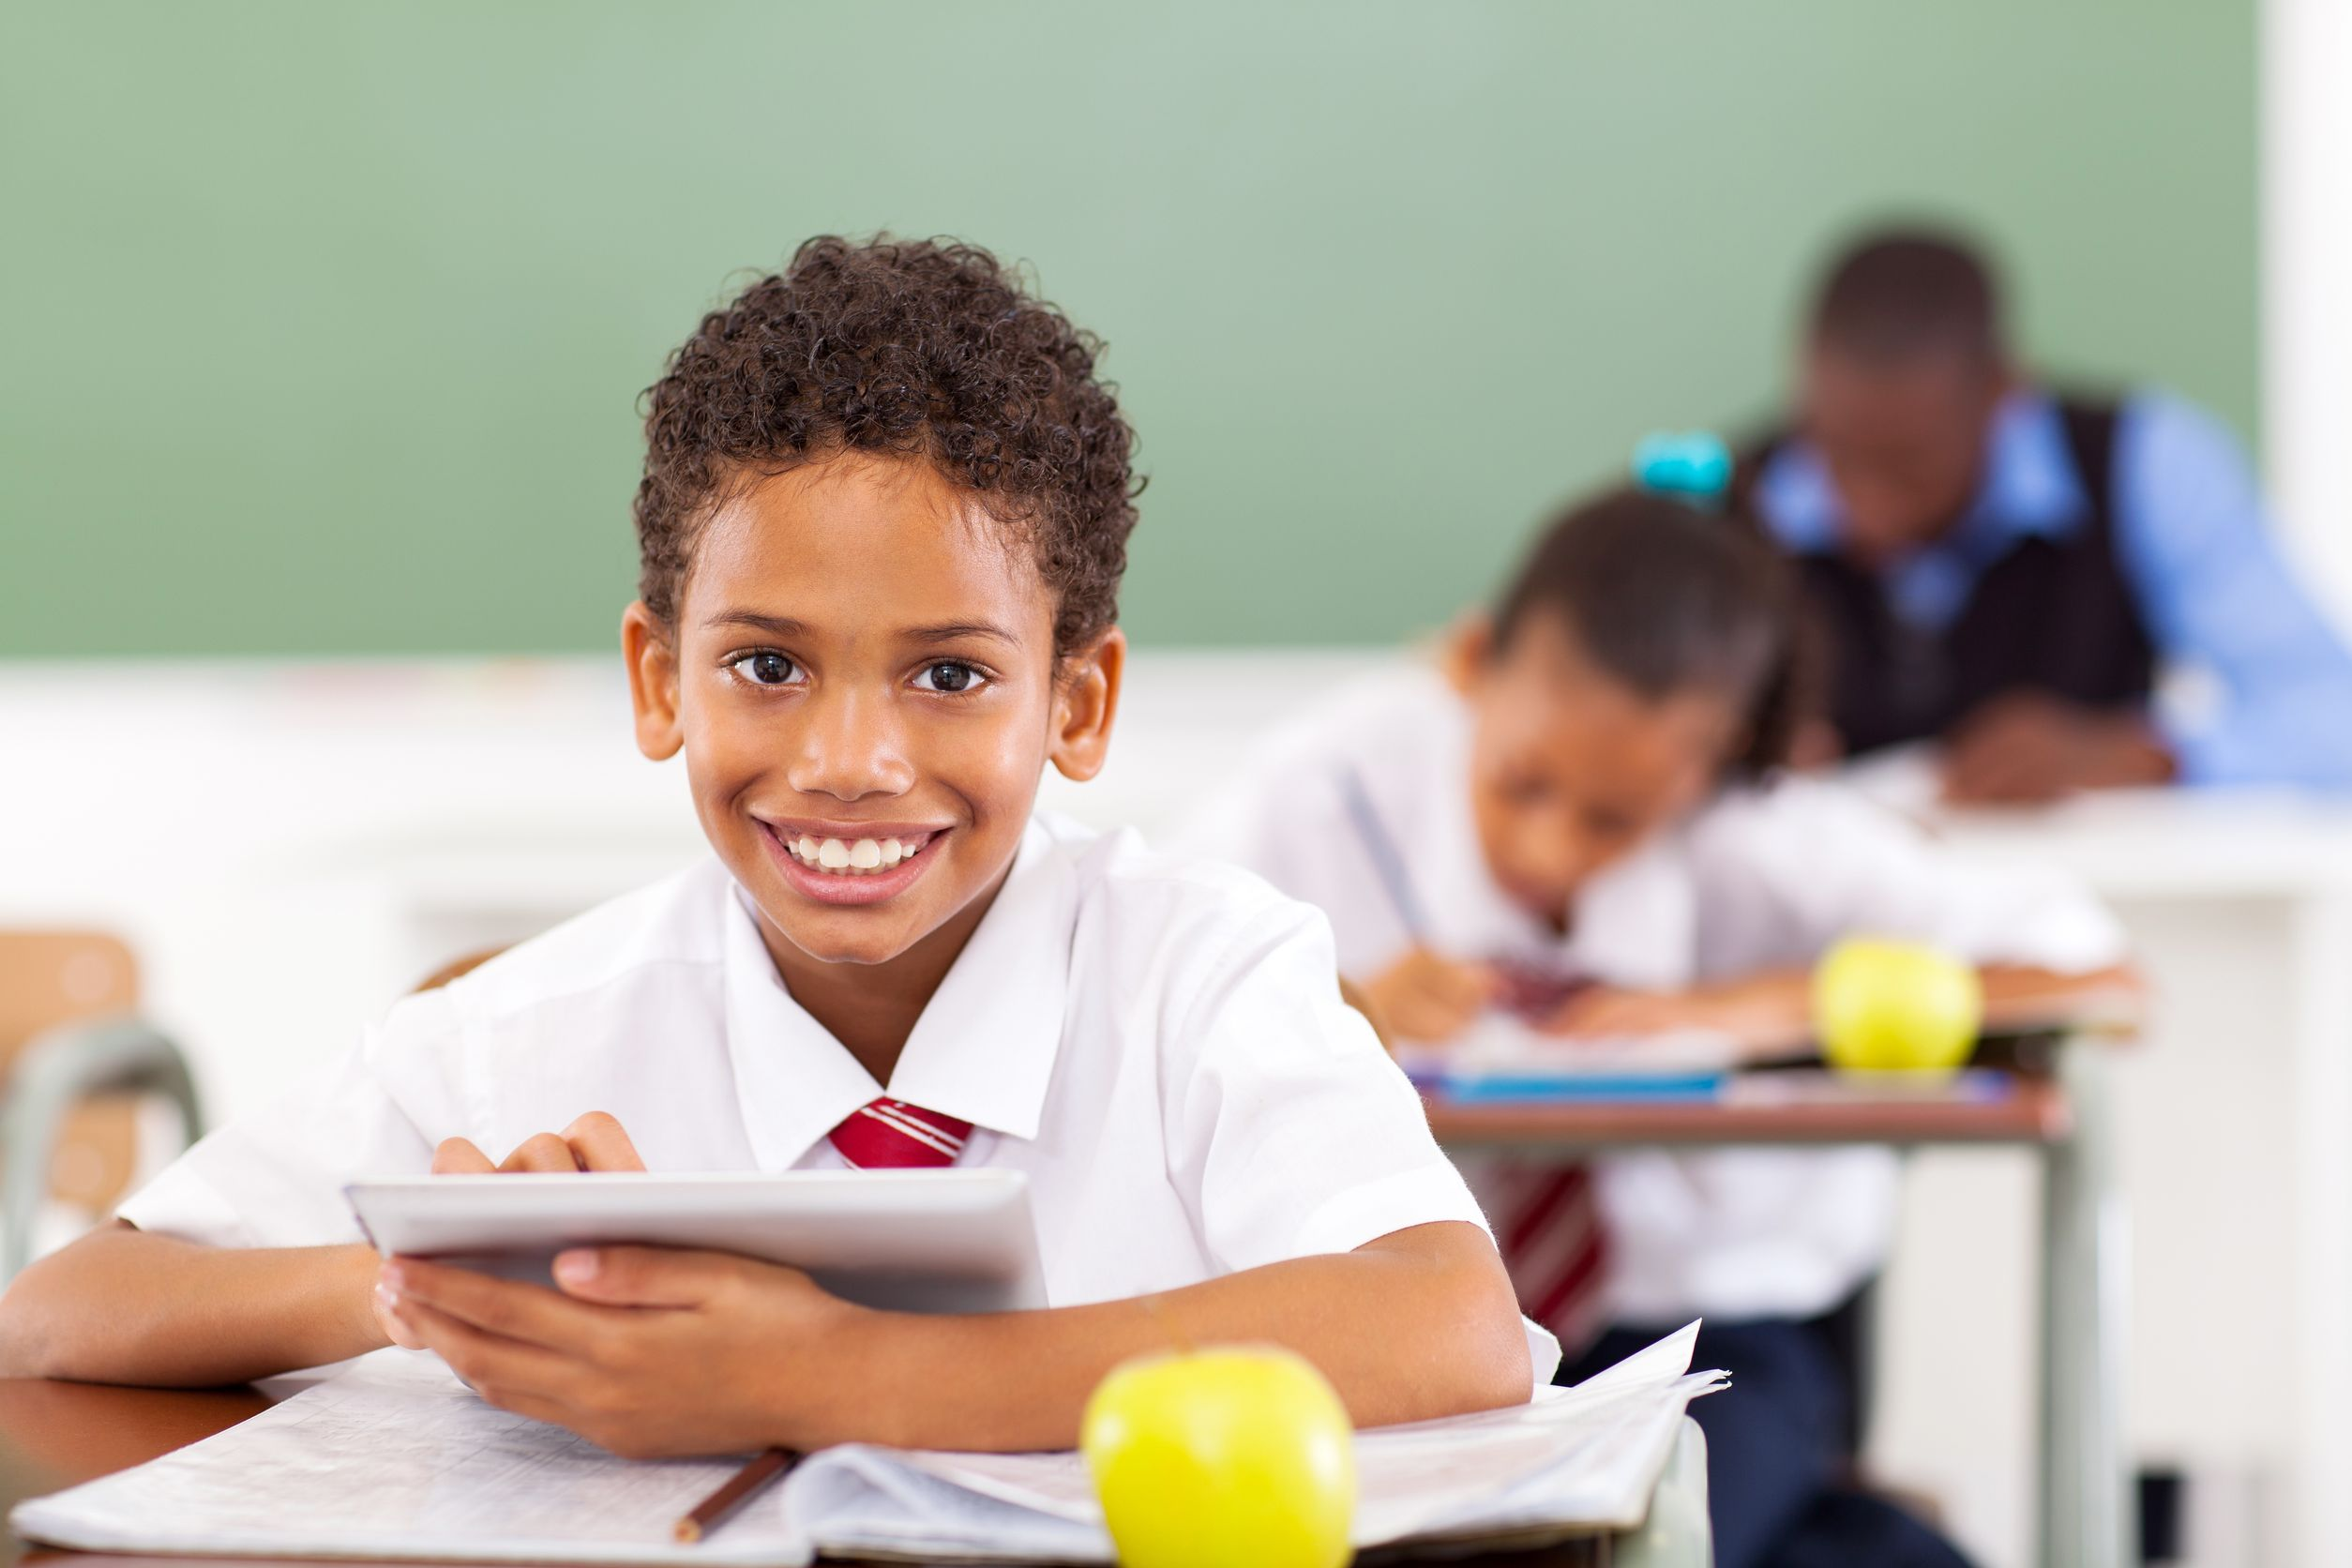 primary school boy using tablet in classroom